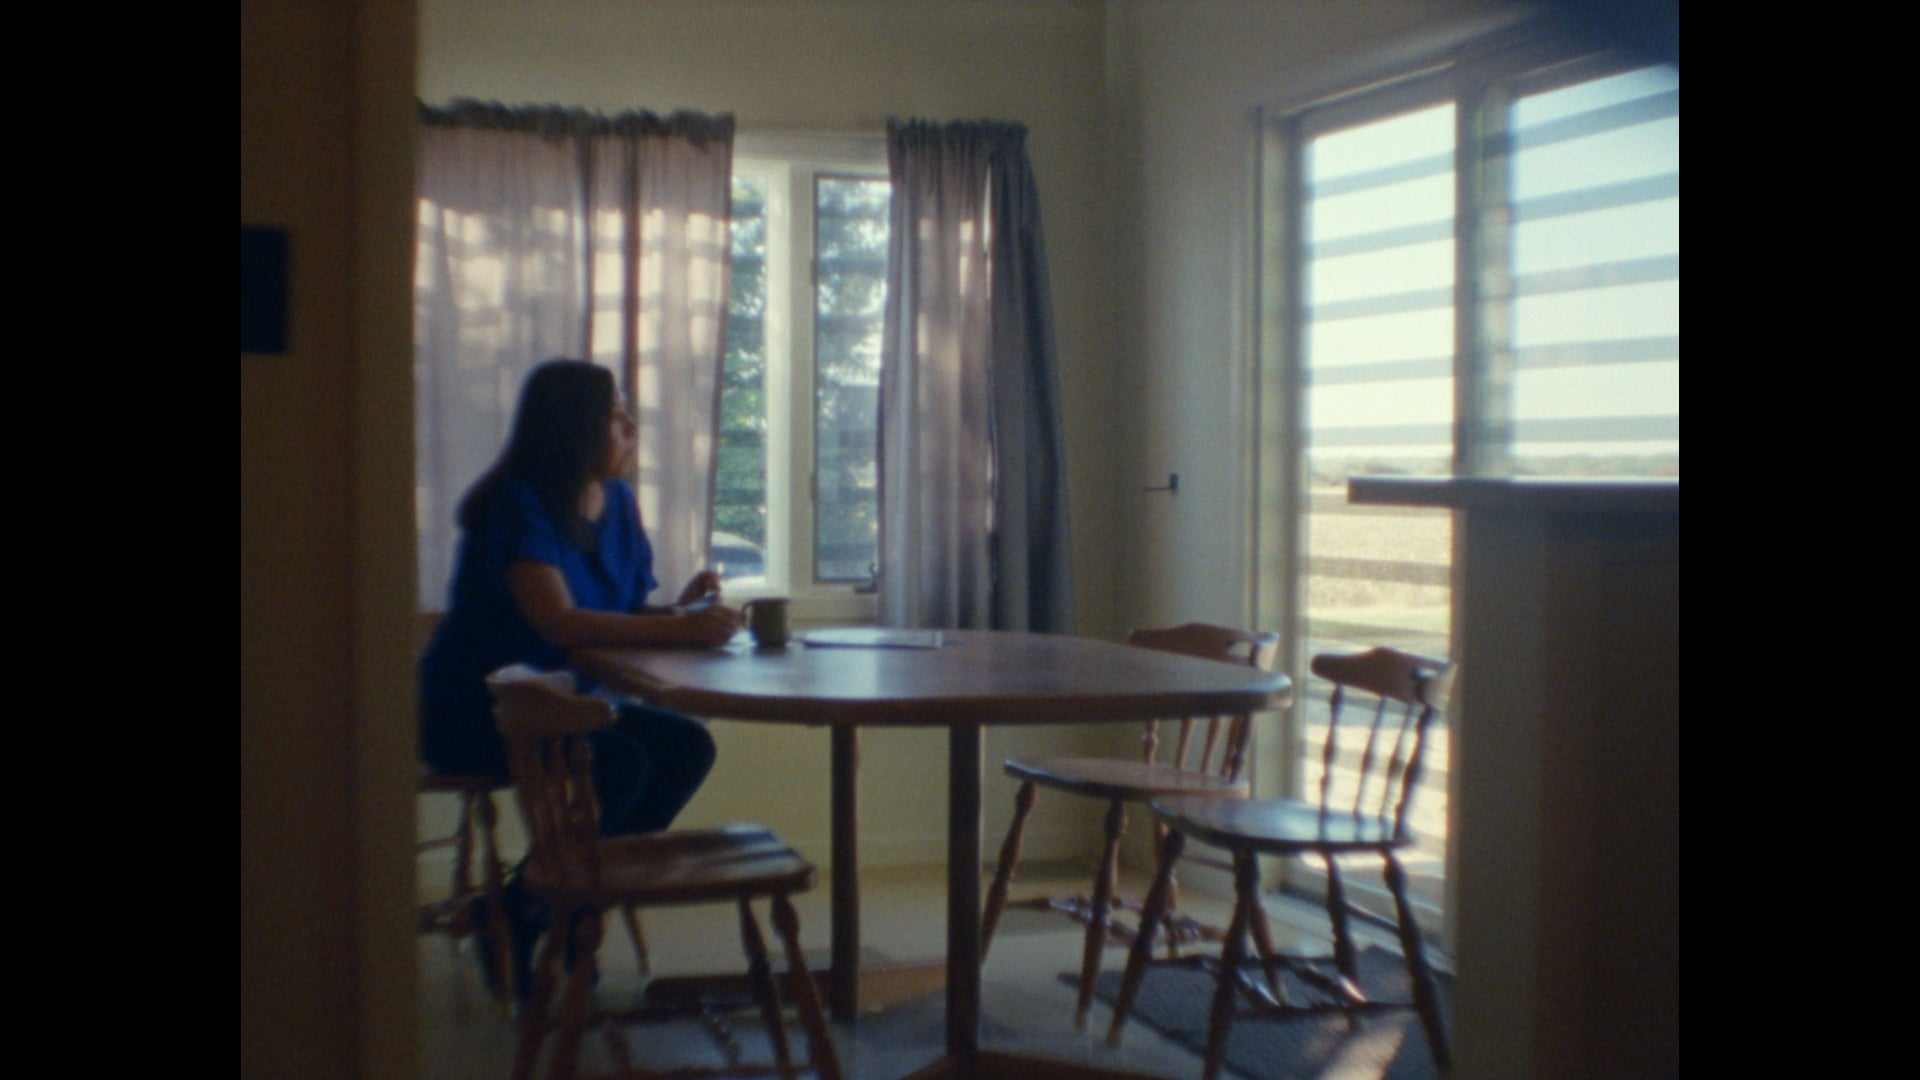 Cranes, Mafiosos and a Polaroid Camera   Poem by Natalie Diaz   Film by Tash Tung